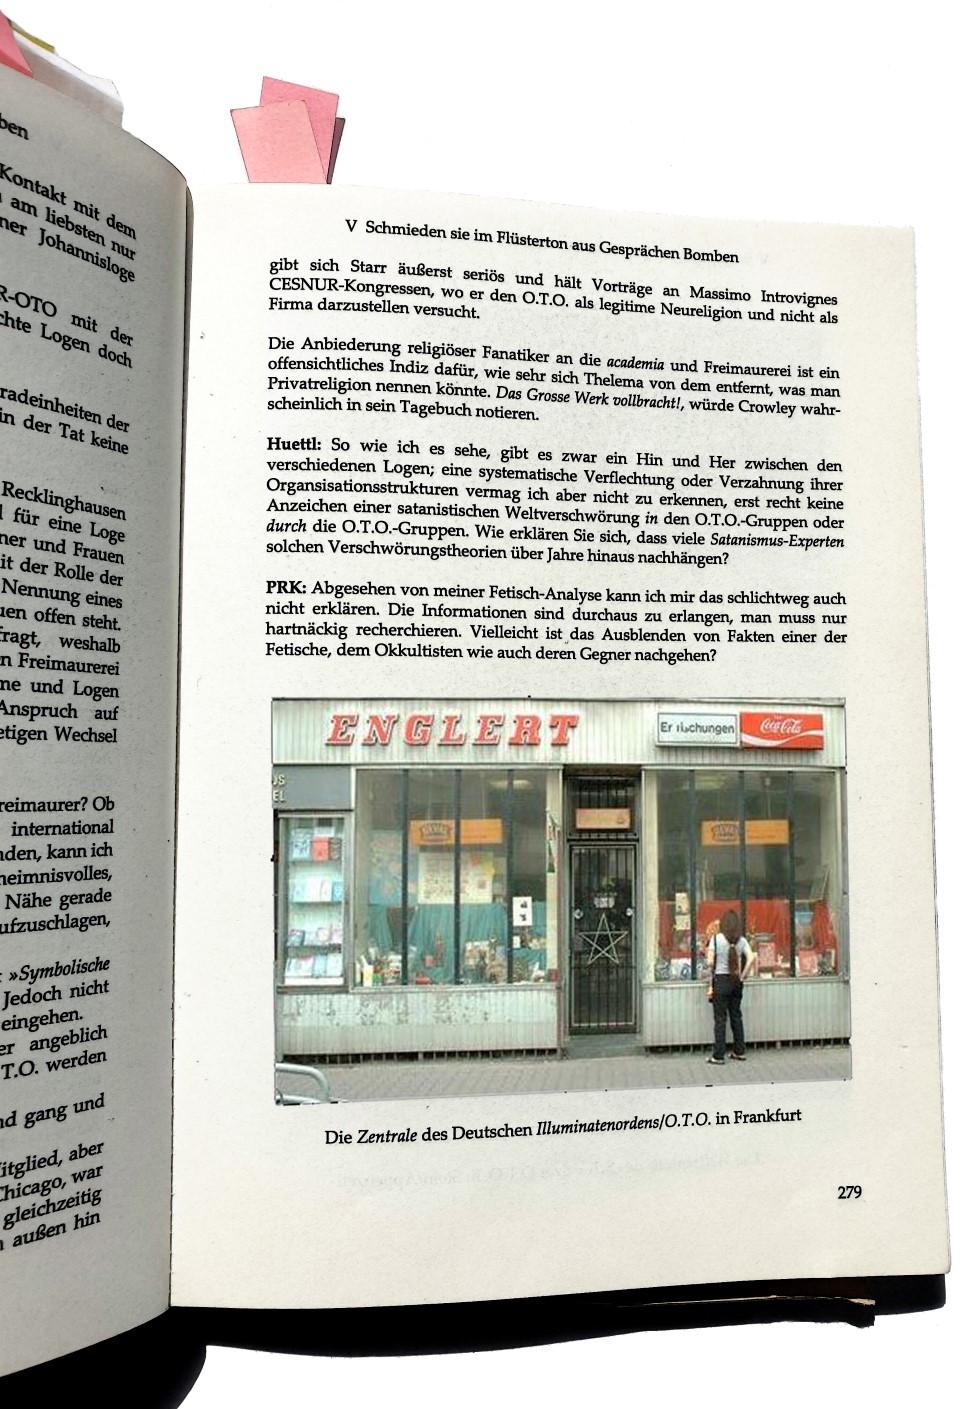 Fraternitas Saturni, Walter Englert, Ordo Templi Orientis, Ordo Illuminatorum, Weltbund der Illuminaten